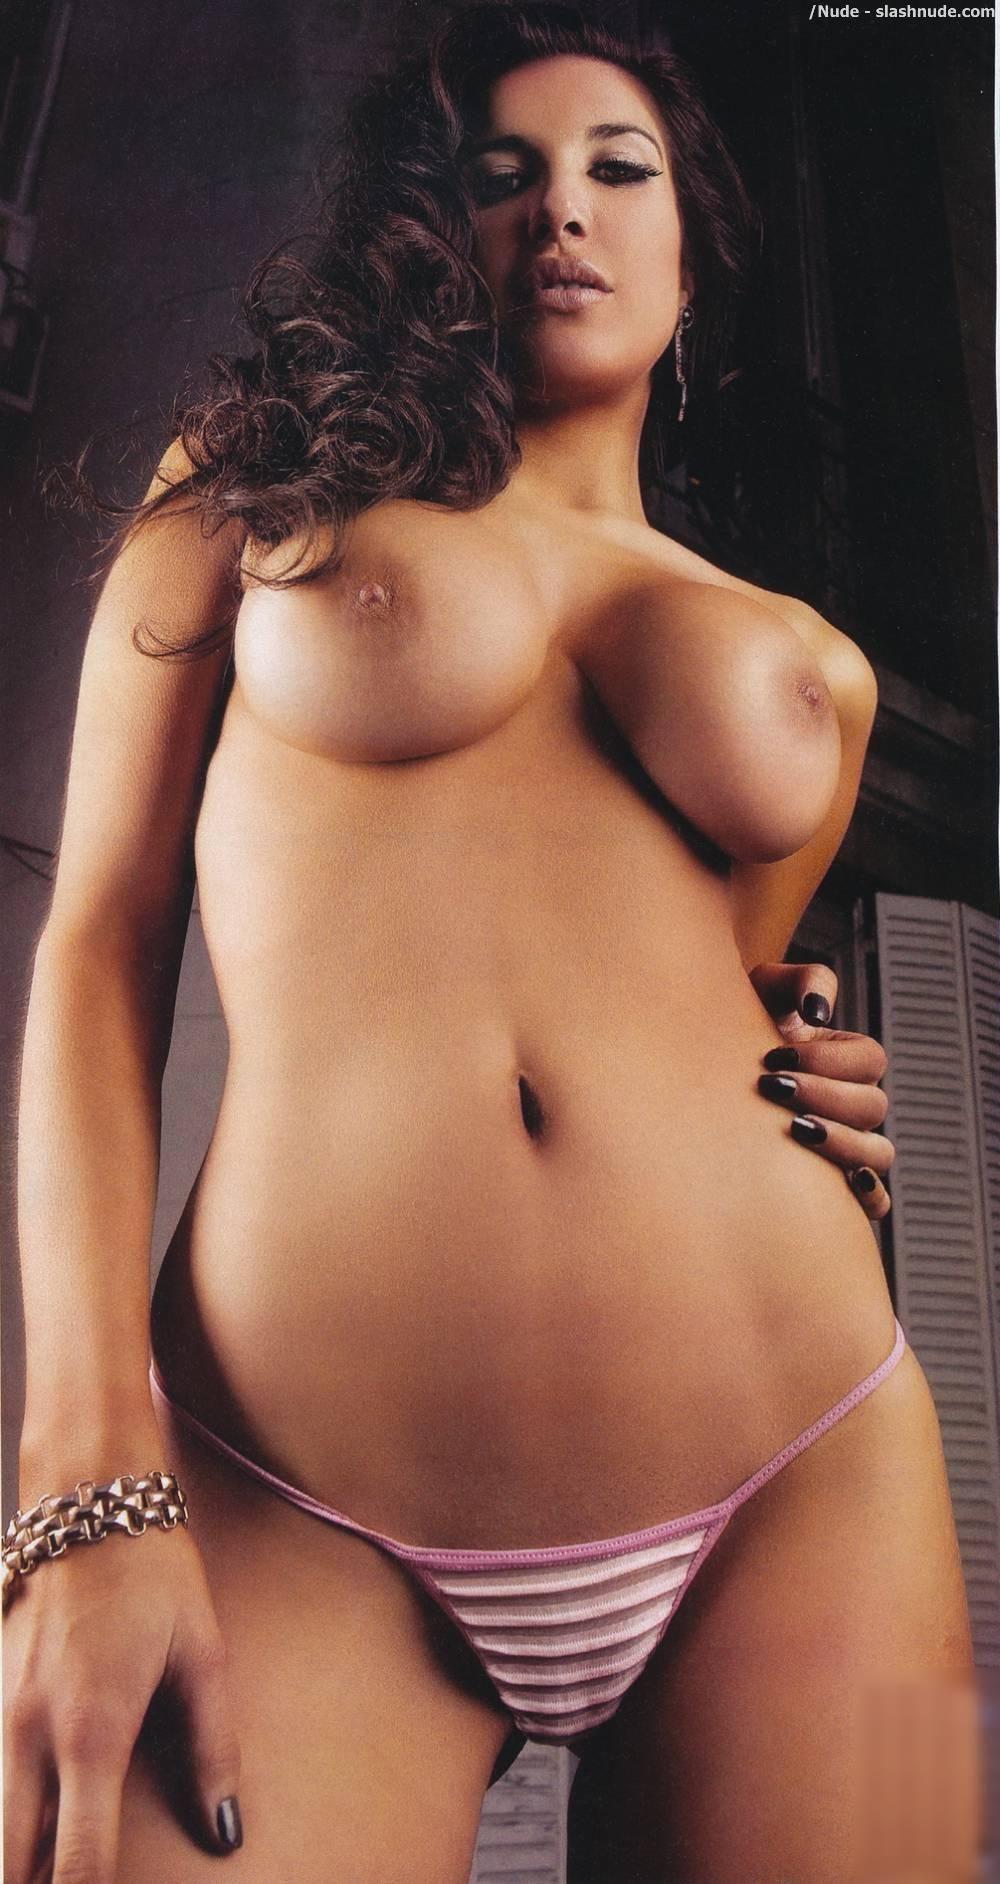 Andrea Rincon Xxx free xxx pictures of andrea rincon naked - pornbv